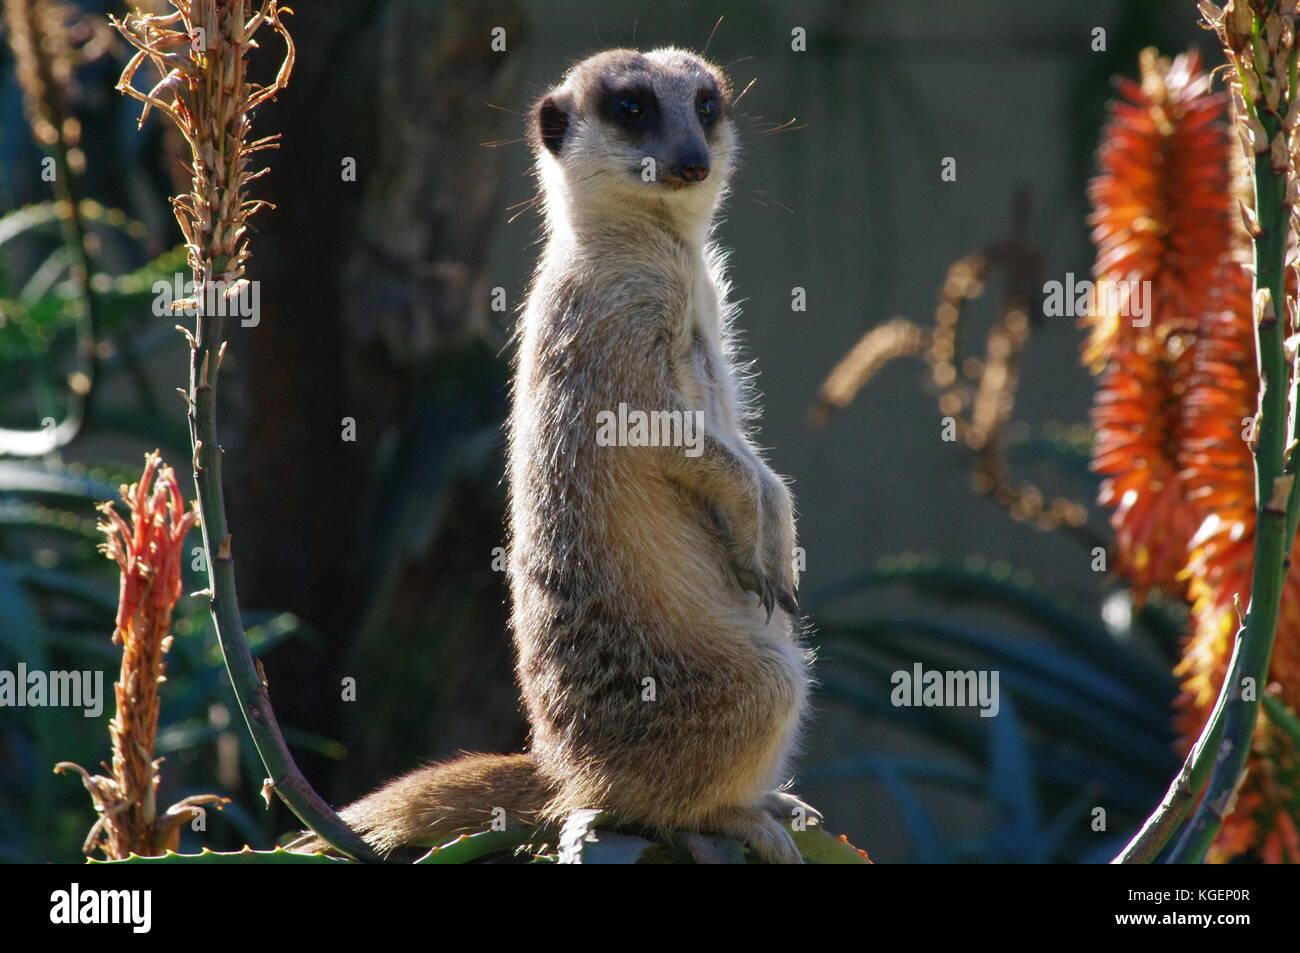 Meerkat Closeup - Stock Image